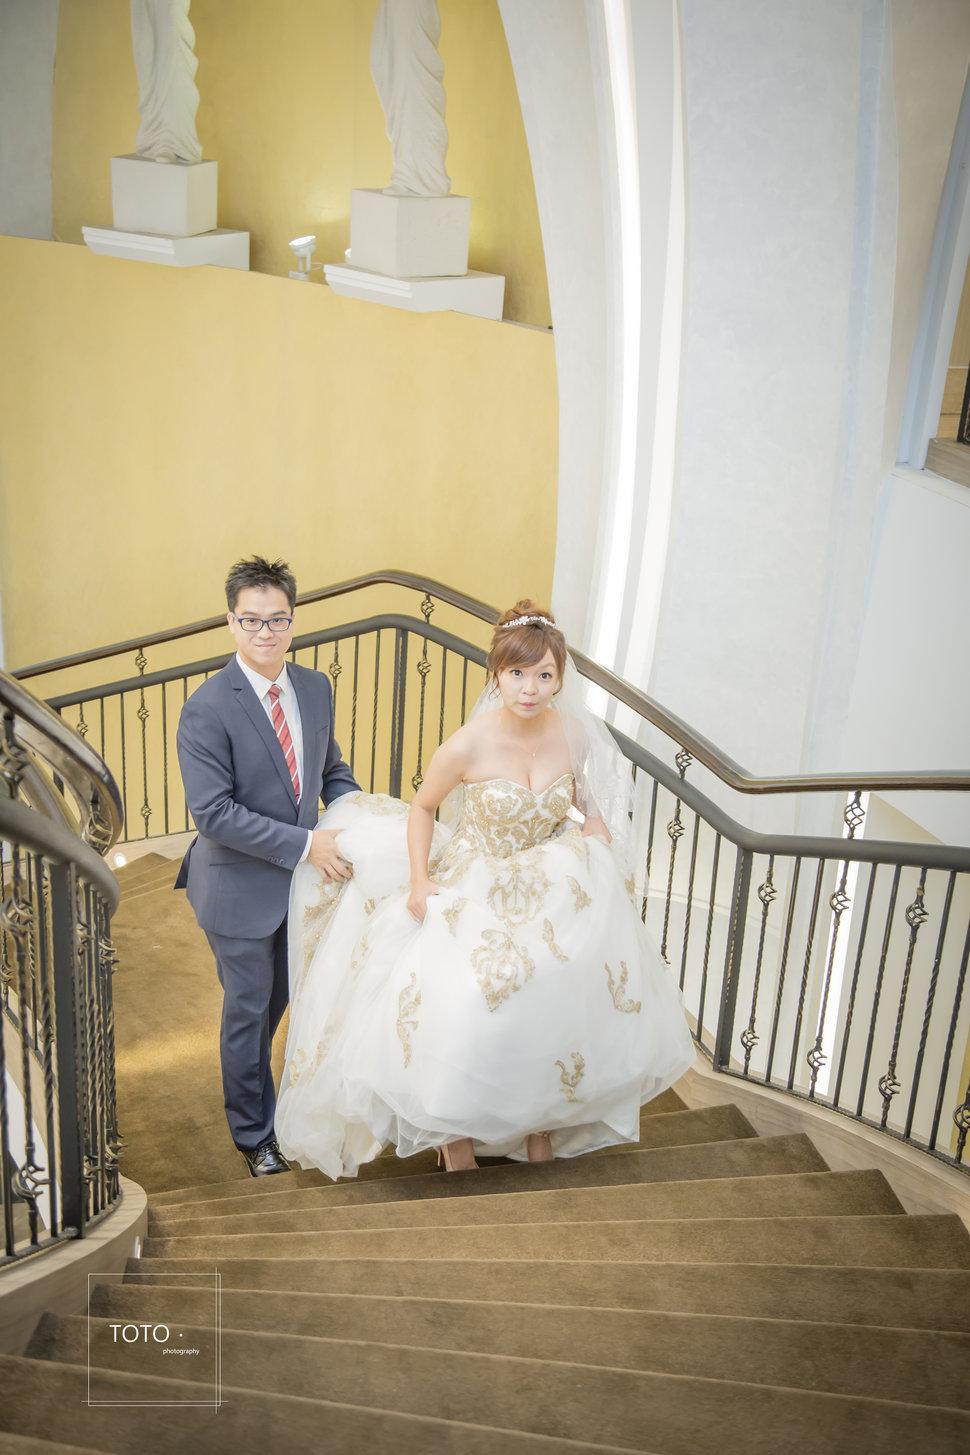 5K0B1559 - TOTO_Photo - 結婚吧